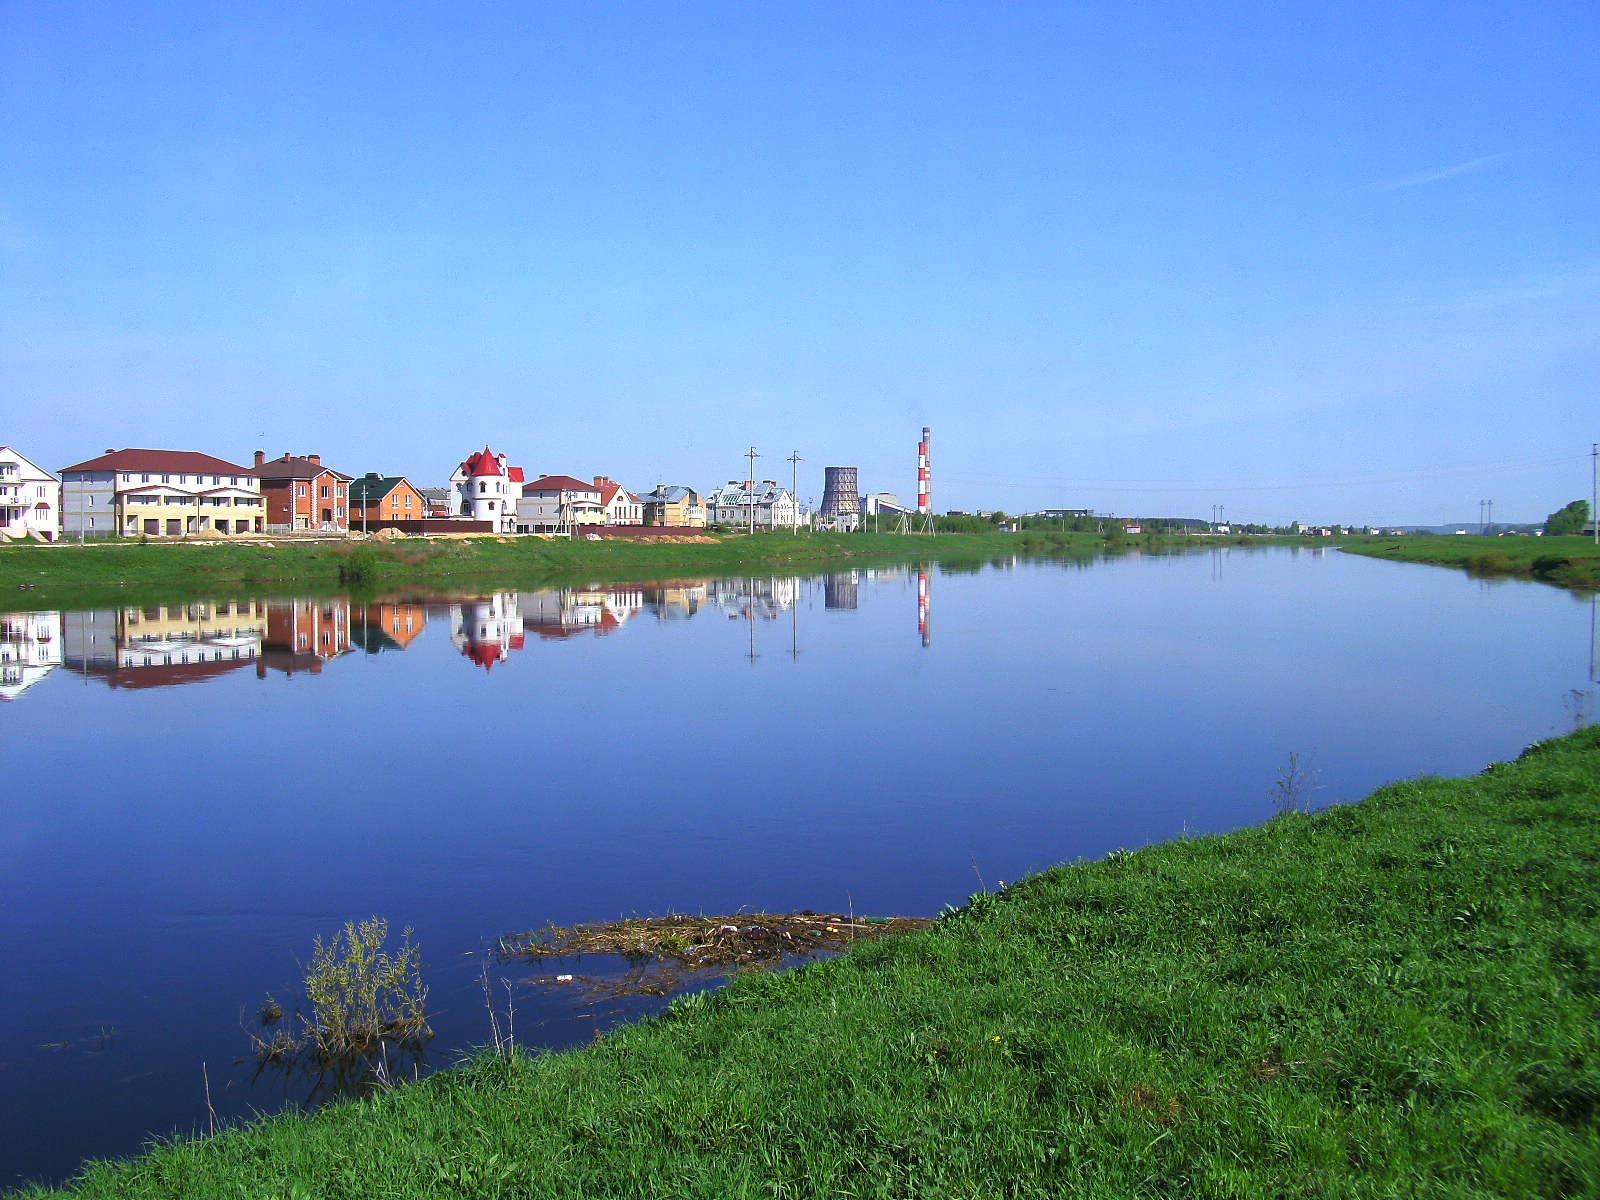 http://forumupload.ru/uploads/0000/0f/16/17138-1-f.jpg